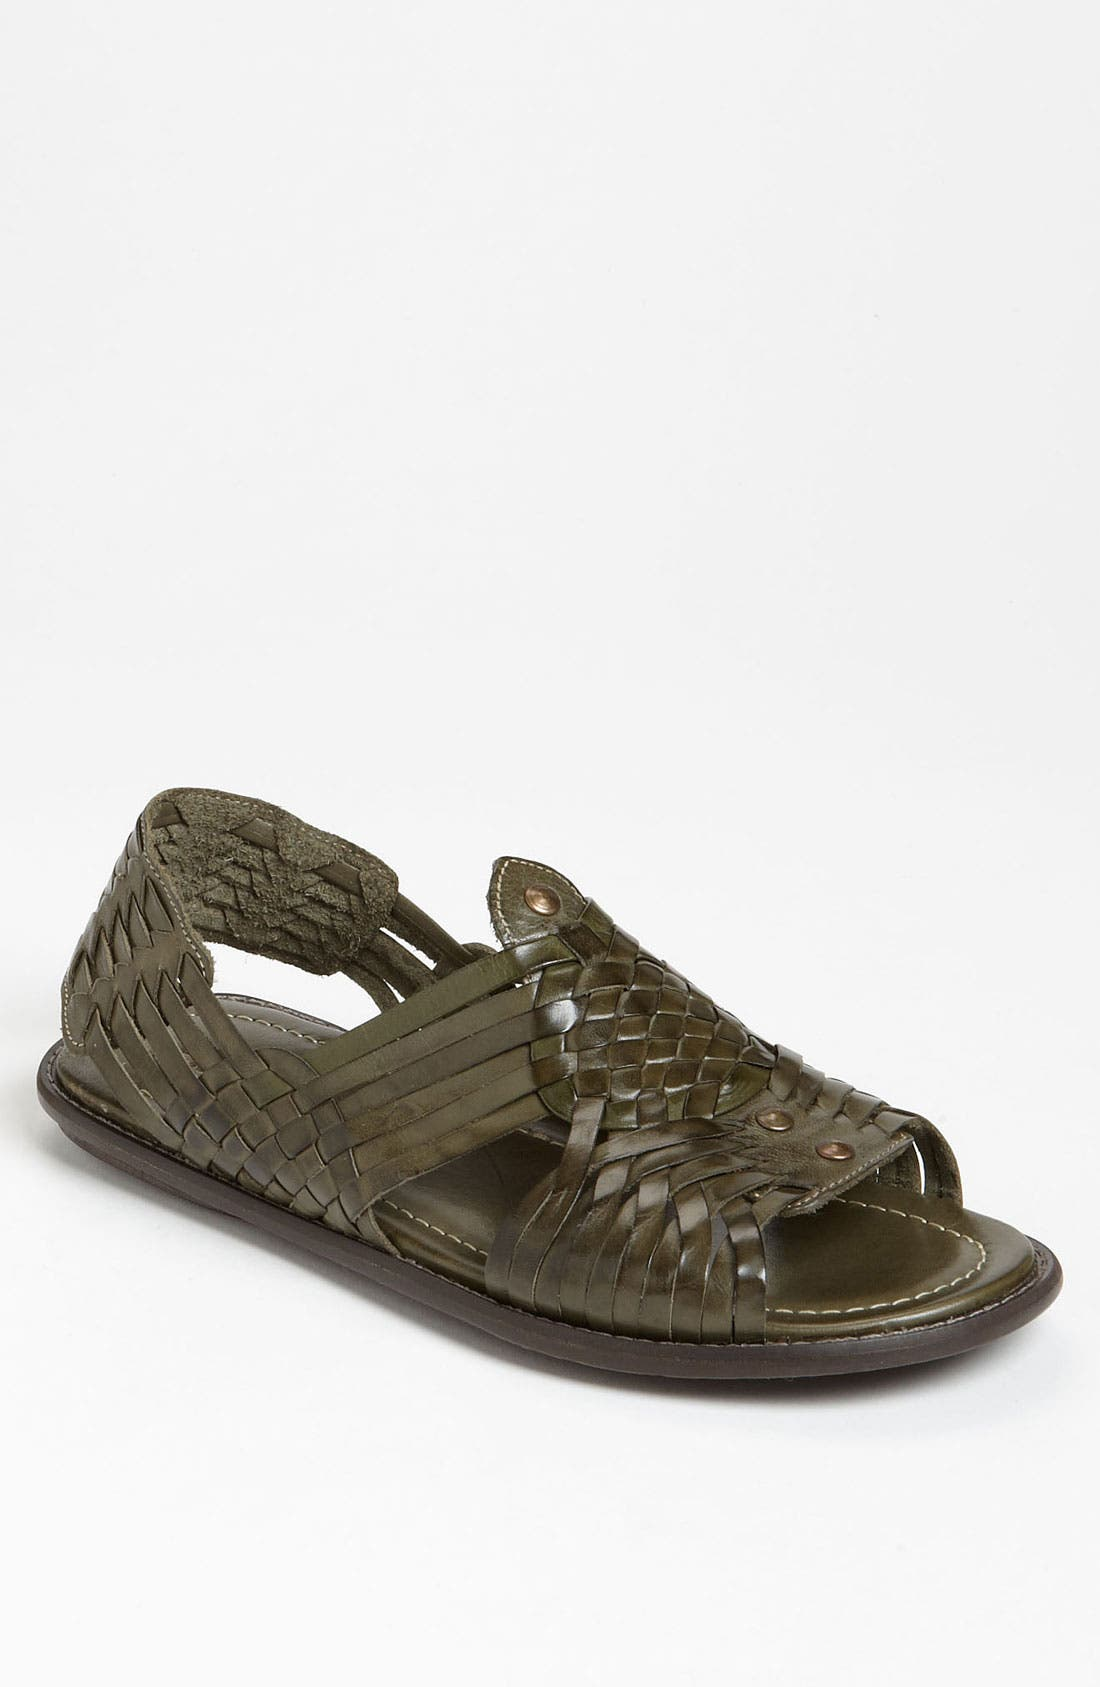 Alternate Image 1 Selected - Bed Stu 'Conde' Huarache Sandal (Online Only)